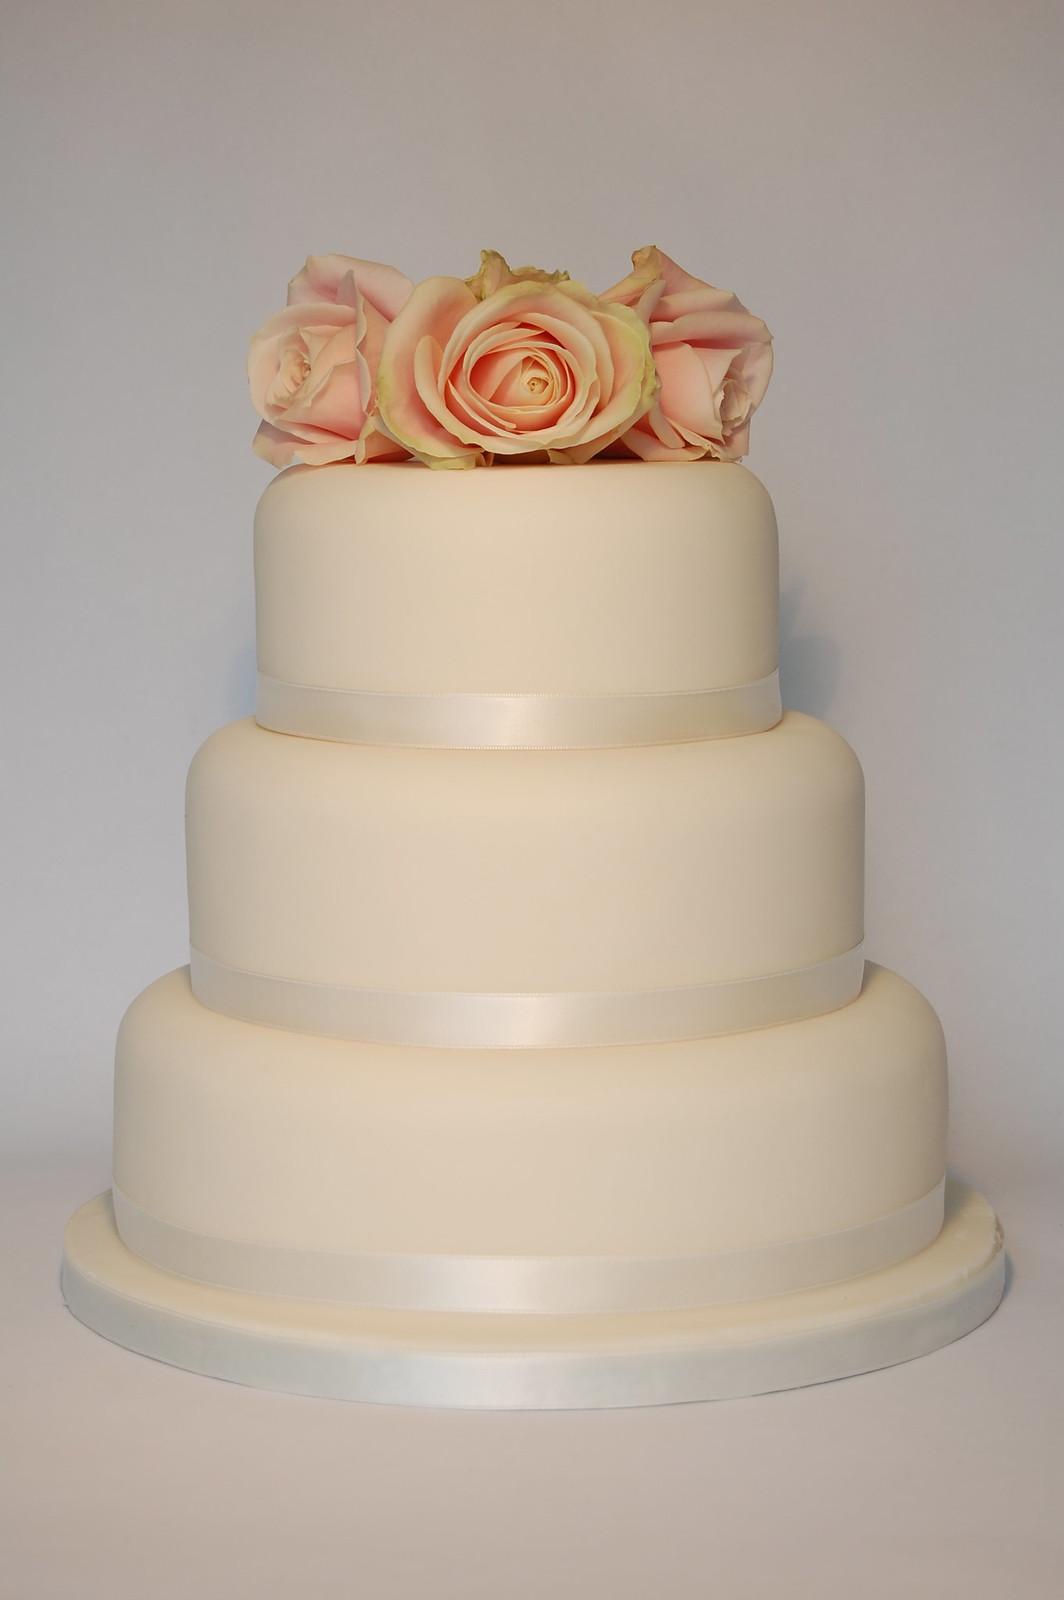 Wedding Cakes Tantalizing Cake Ideas and Designs